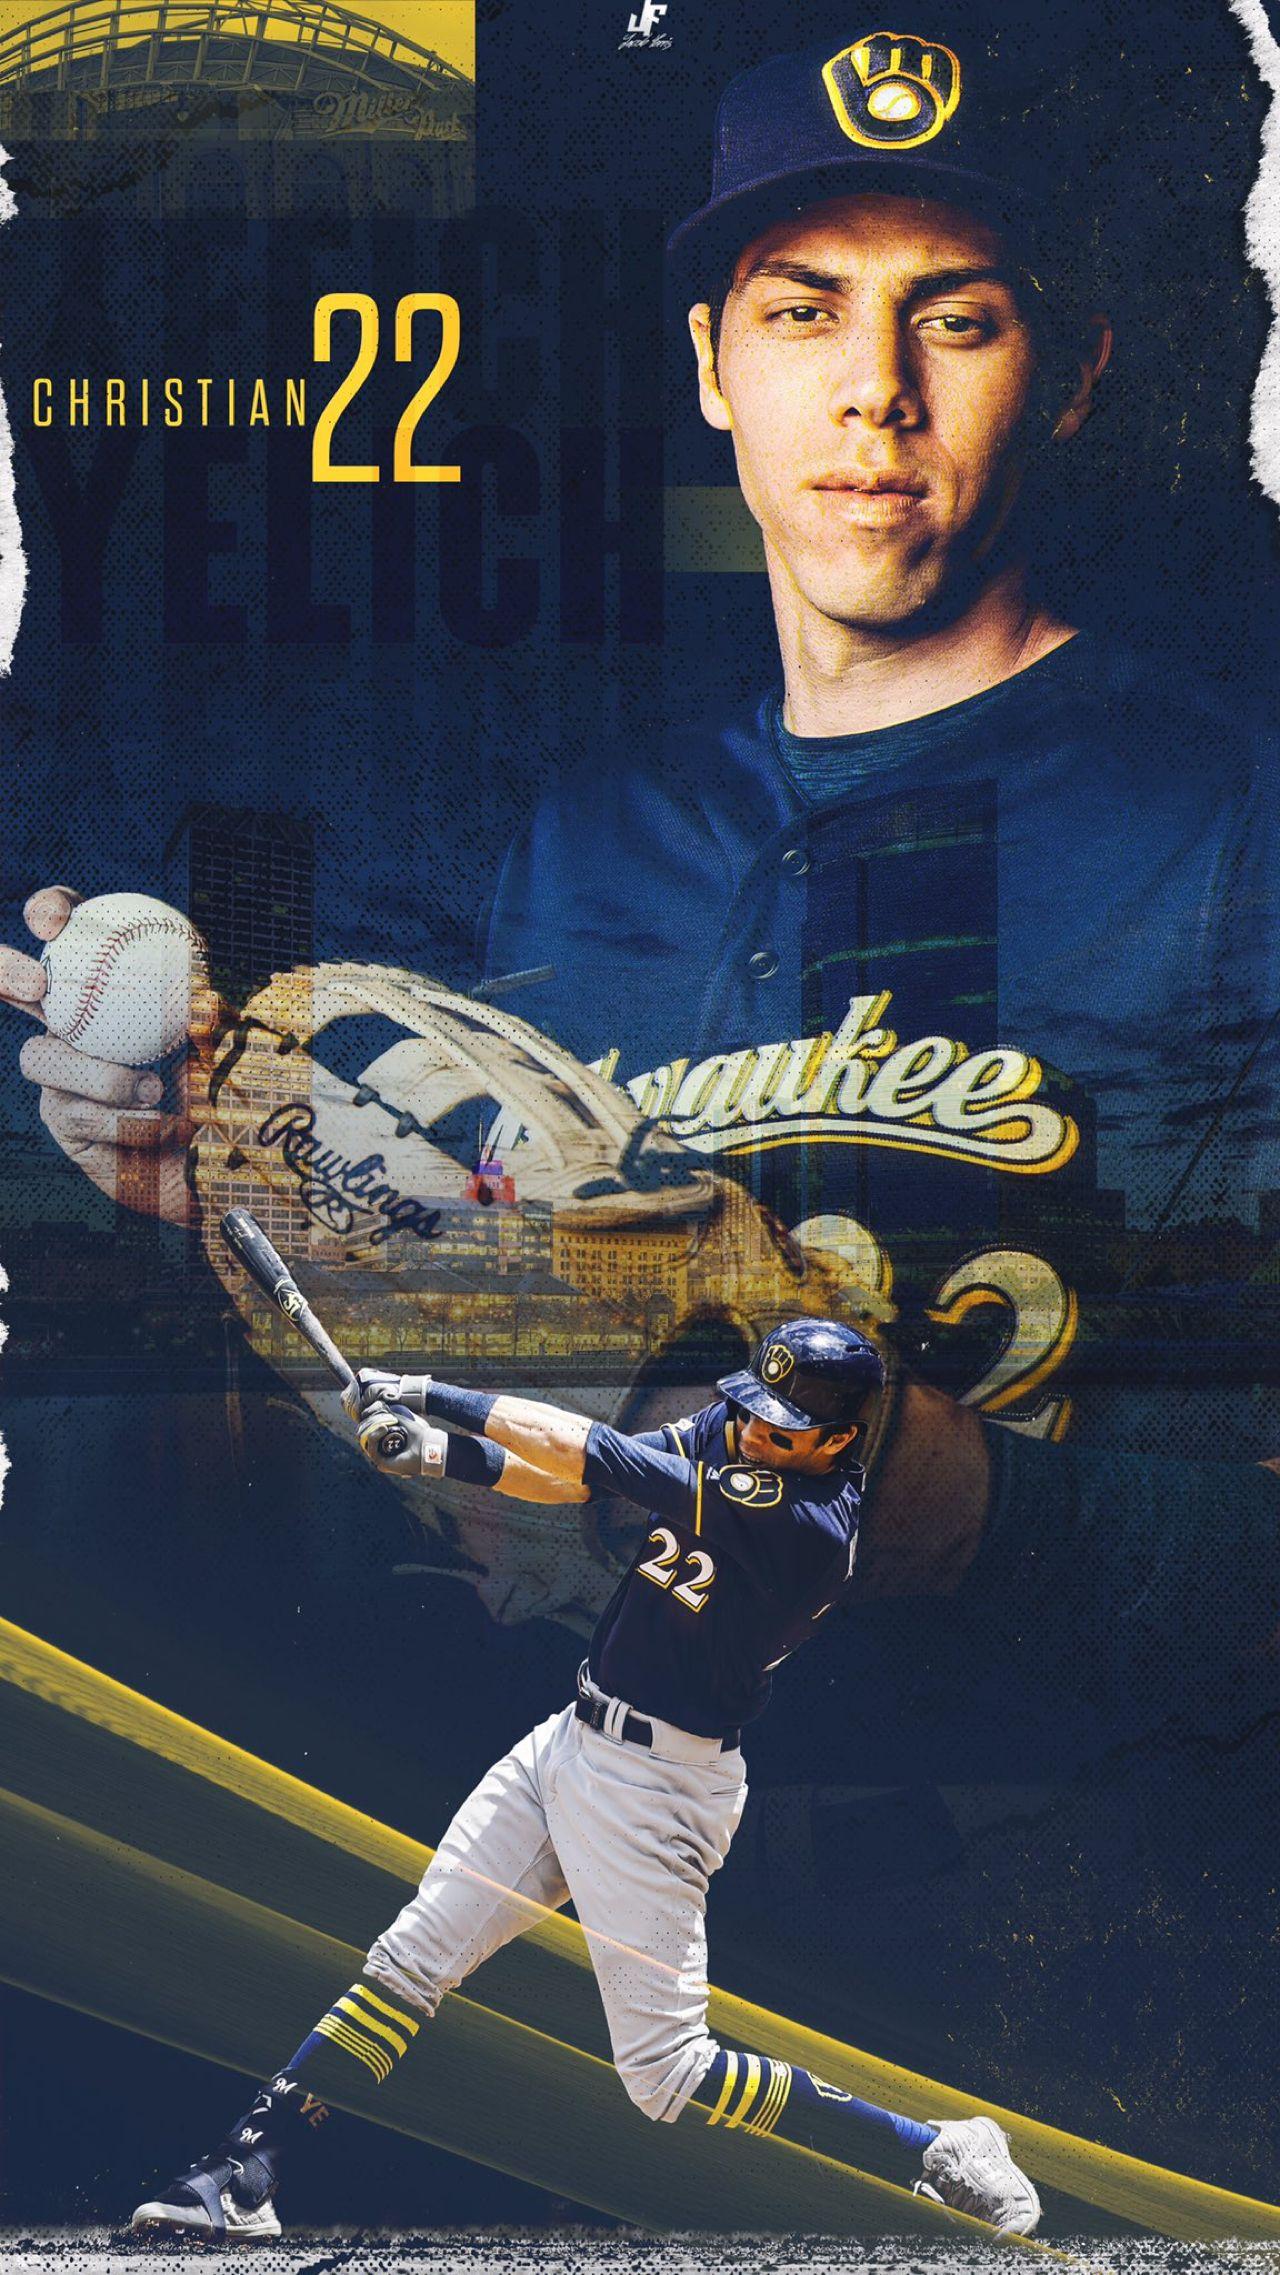 Pin By T J Wᴀᴇɢᴇ On Milwaukee Brewers Christian Yelich Christian Yelich Wallpaper Brewers Baseball